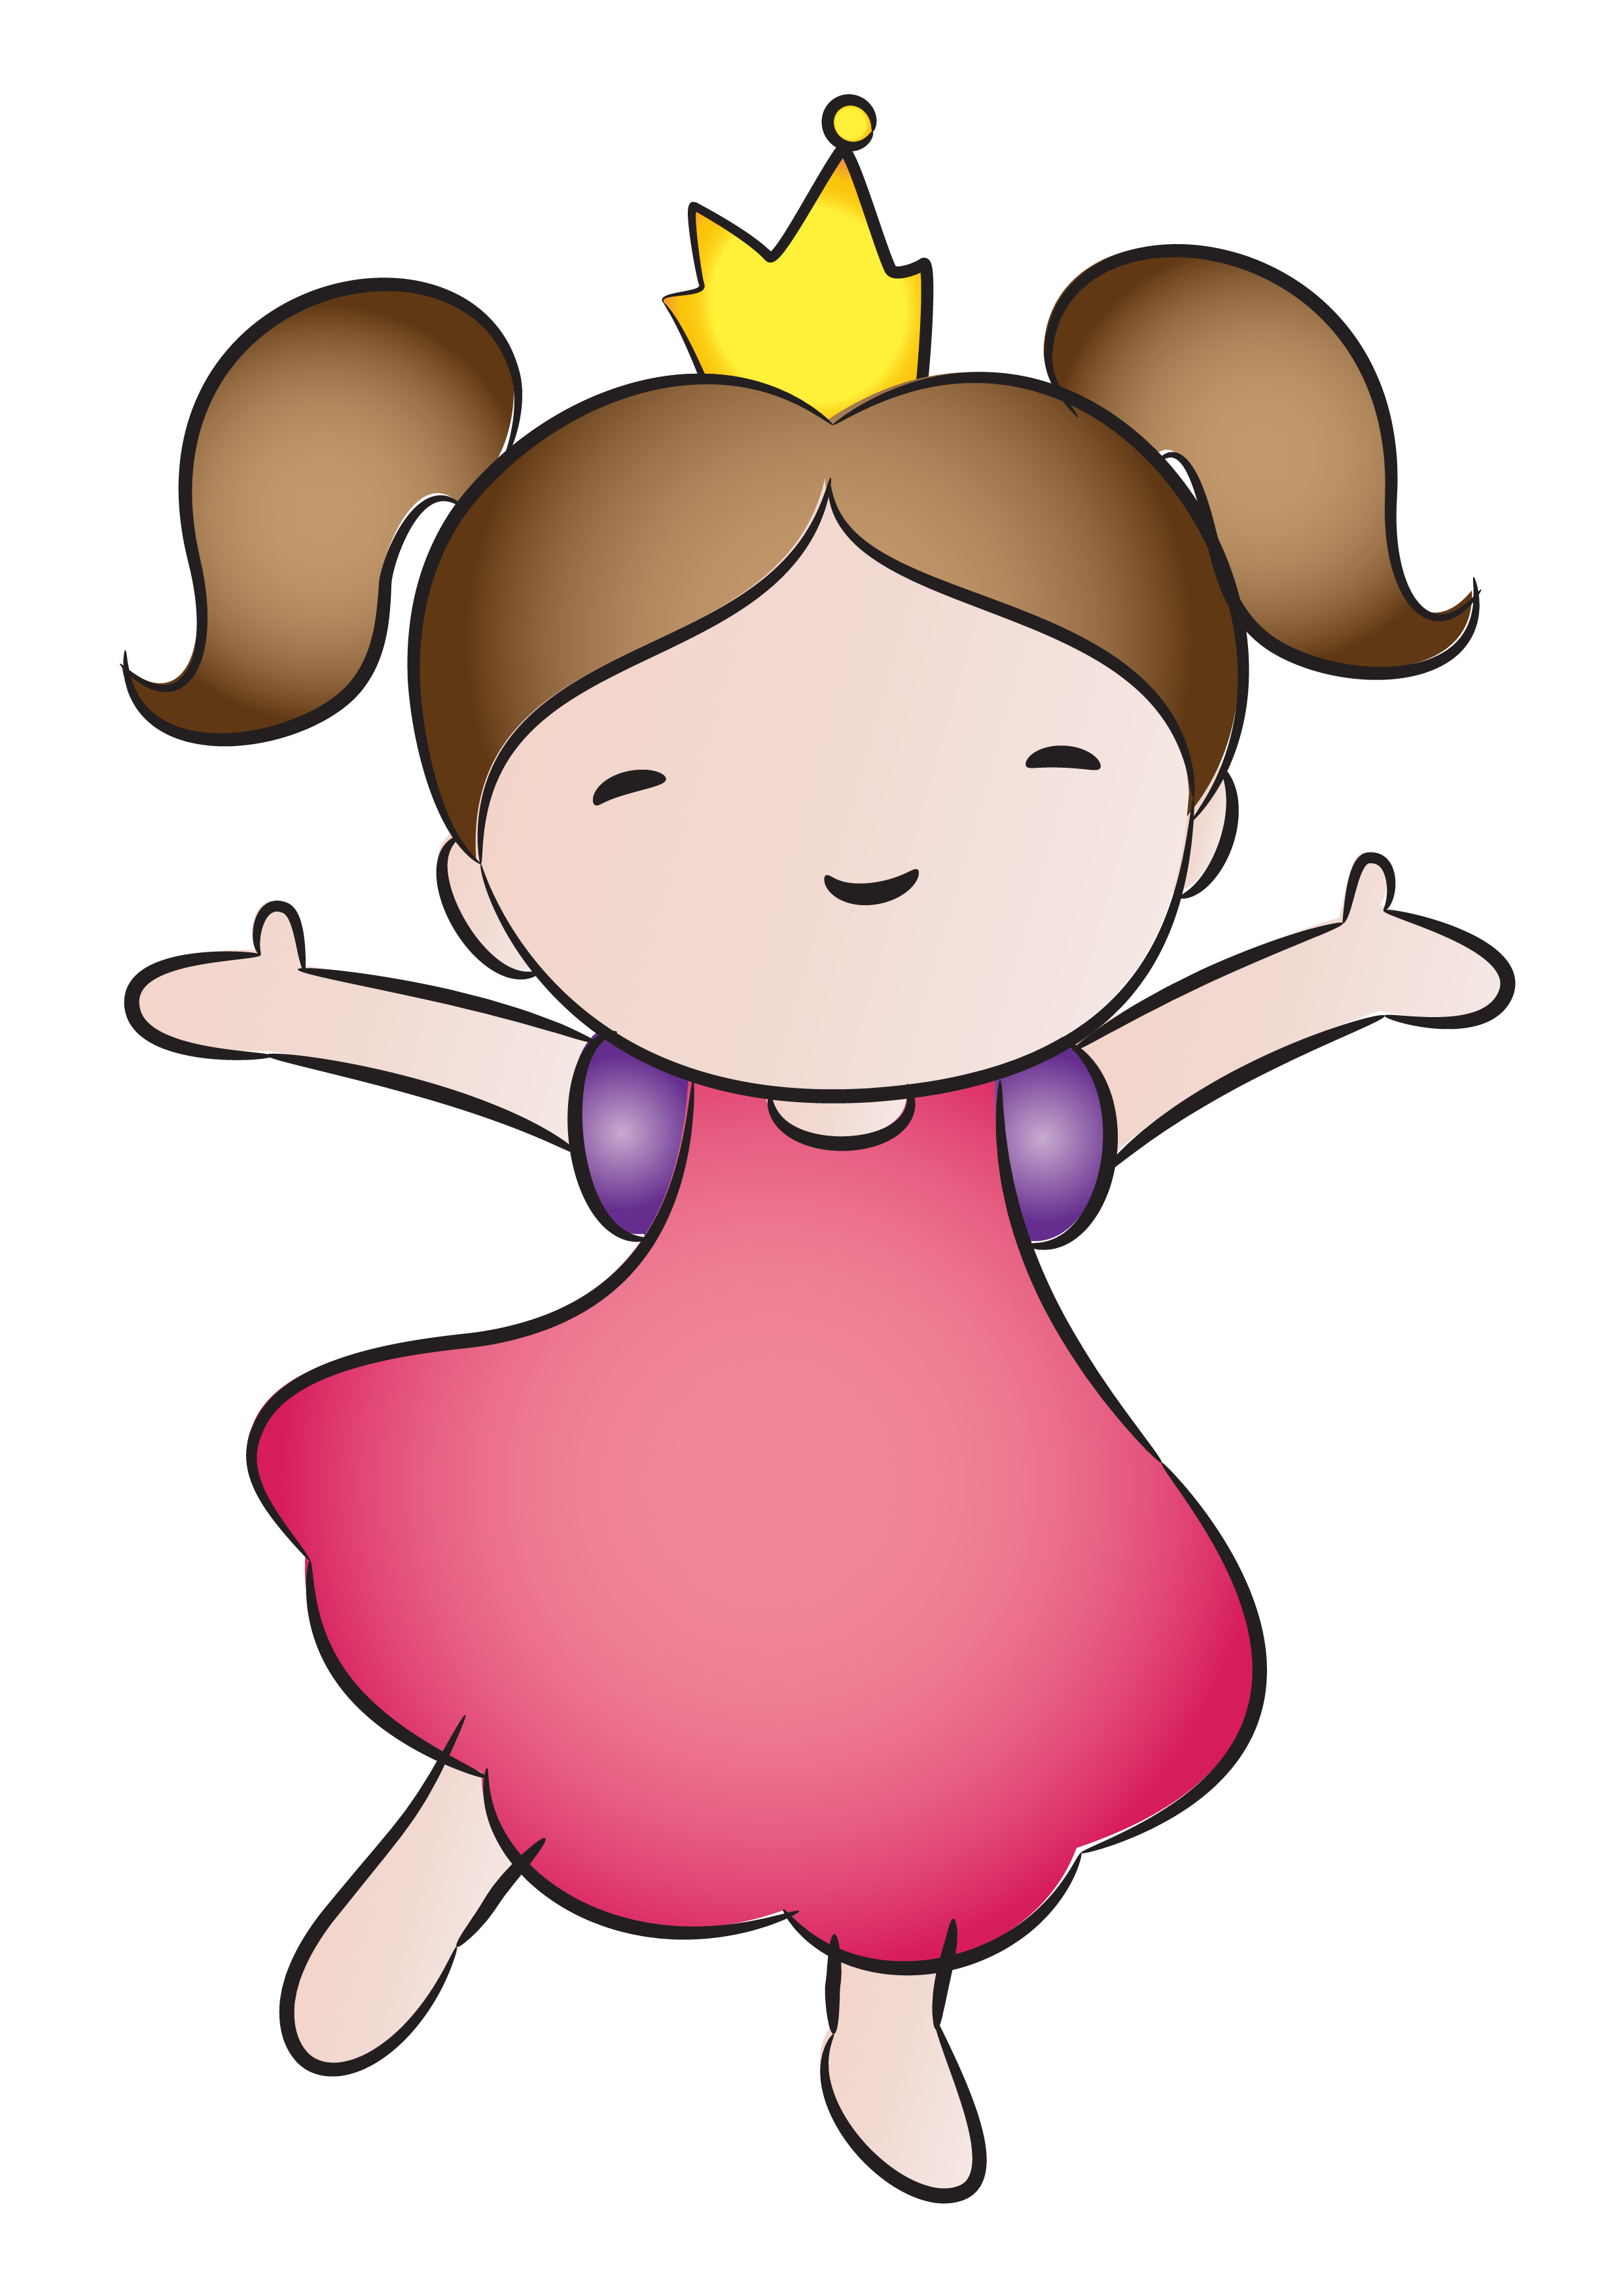 graphic design creative Princess Z